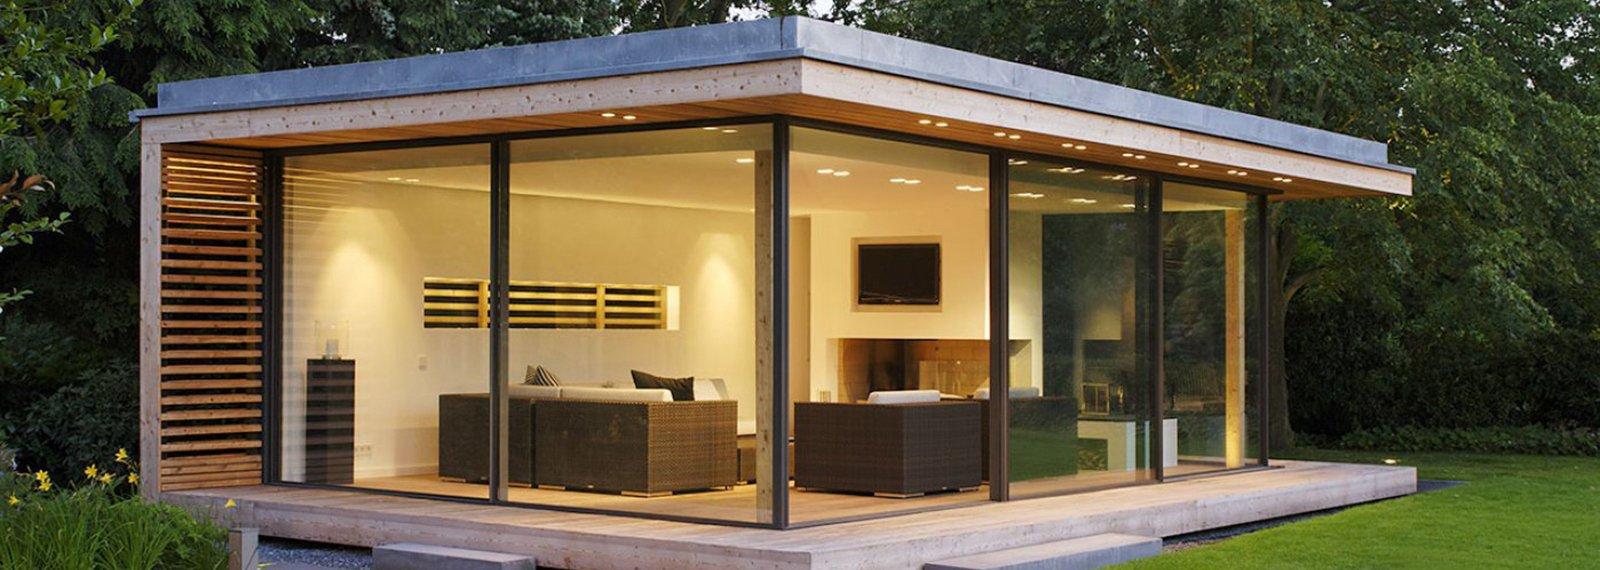 Studio De Jardin Bois Habitable Pool House Extension Maison serapportantà Bureau De Jardin En Kit